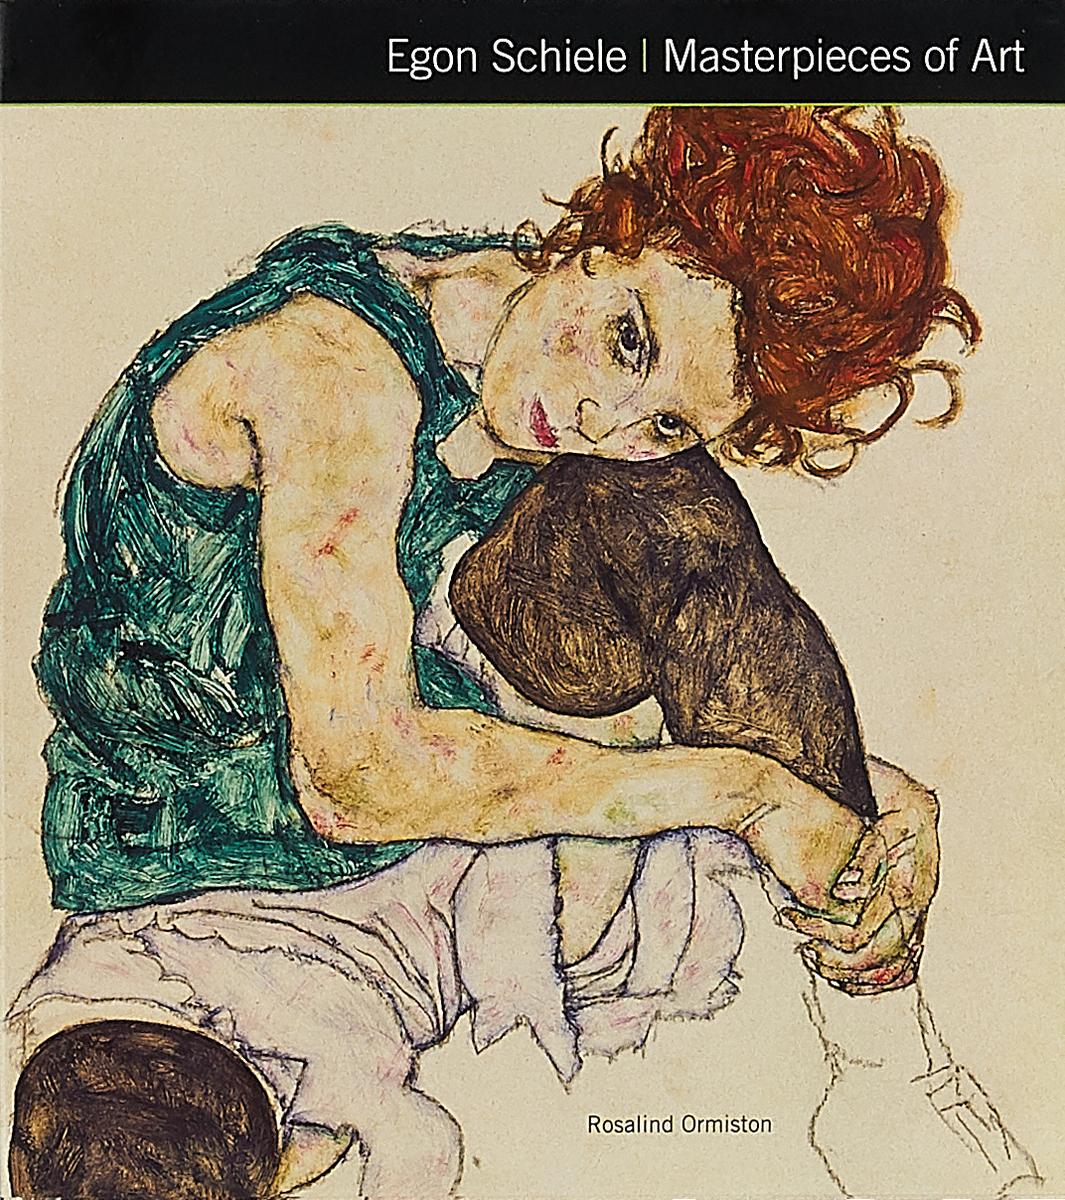 Egon Schiele / Masterpieces of Art 1000 masterpieces of decorative art